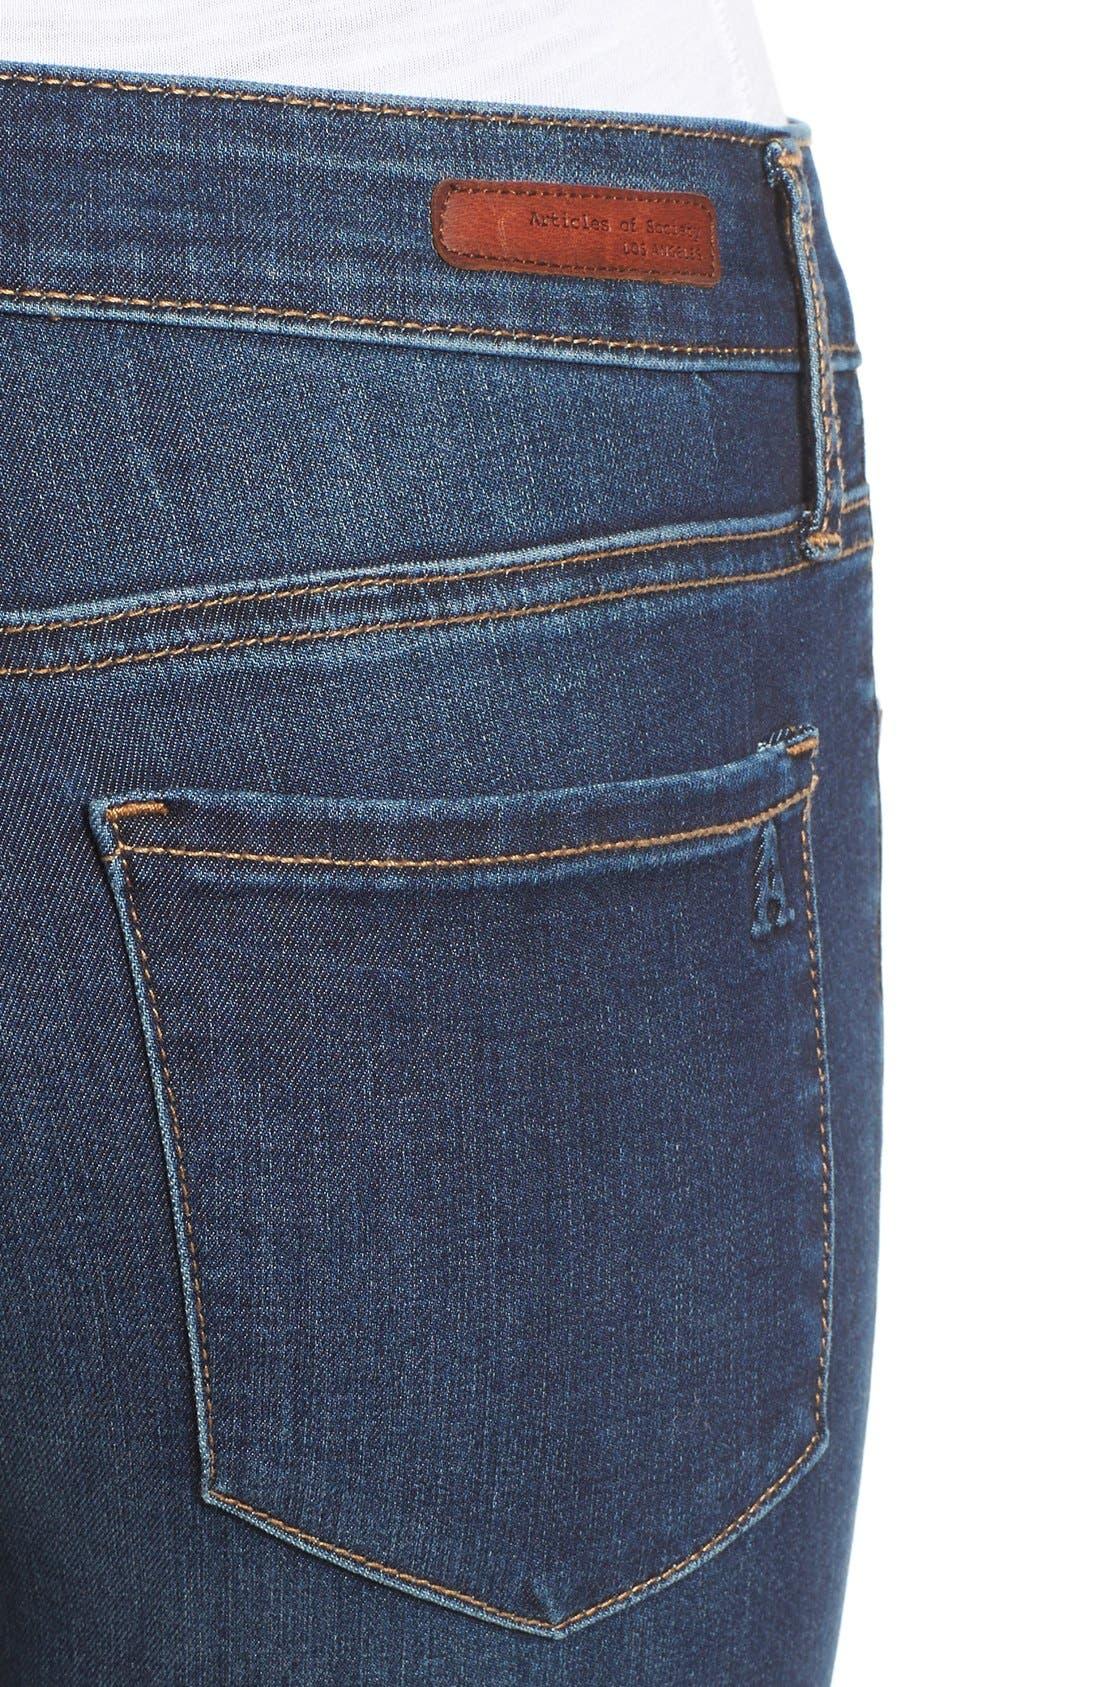 Alternate Image 4  - Articles of Society 'Mya' Skinny Jeans (Tahoe)